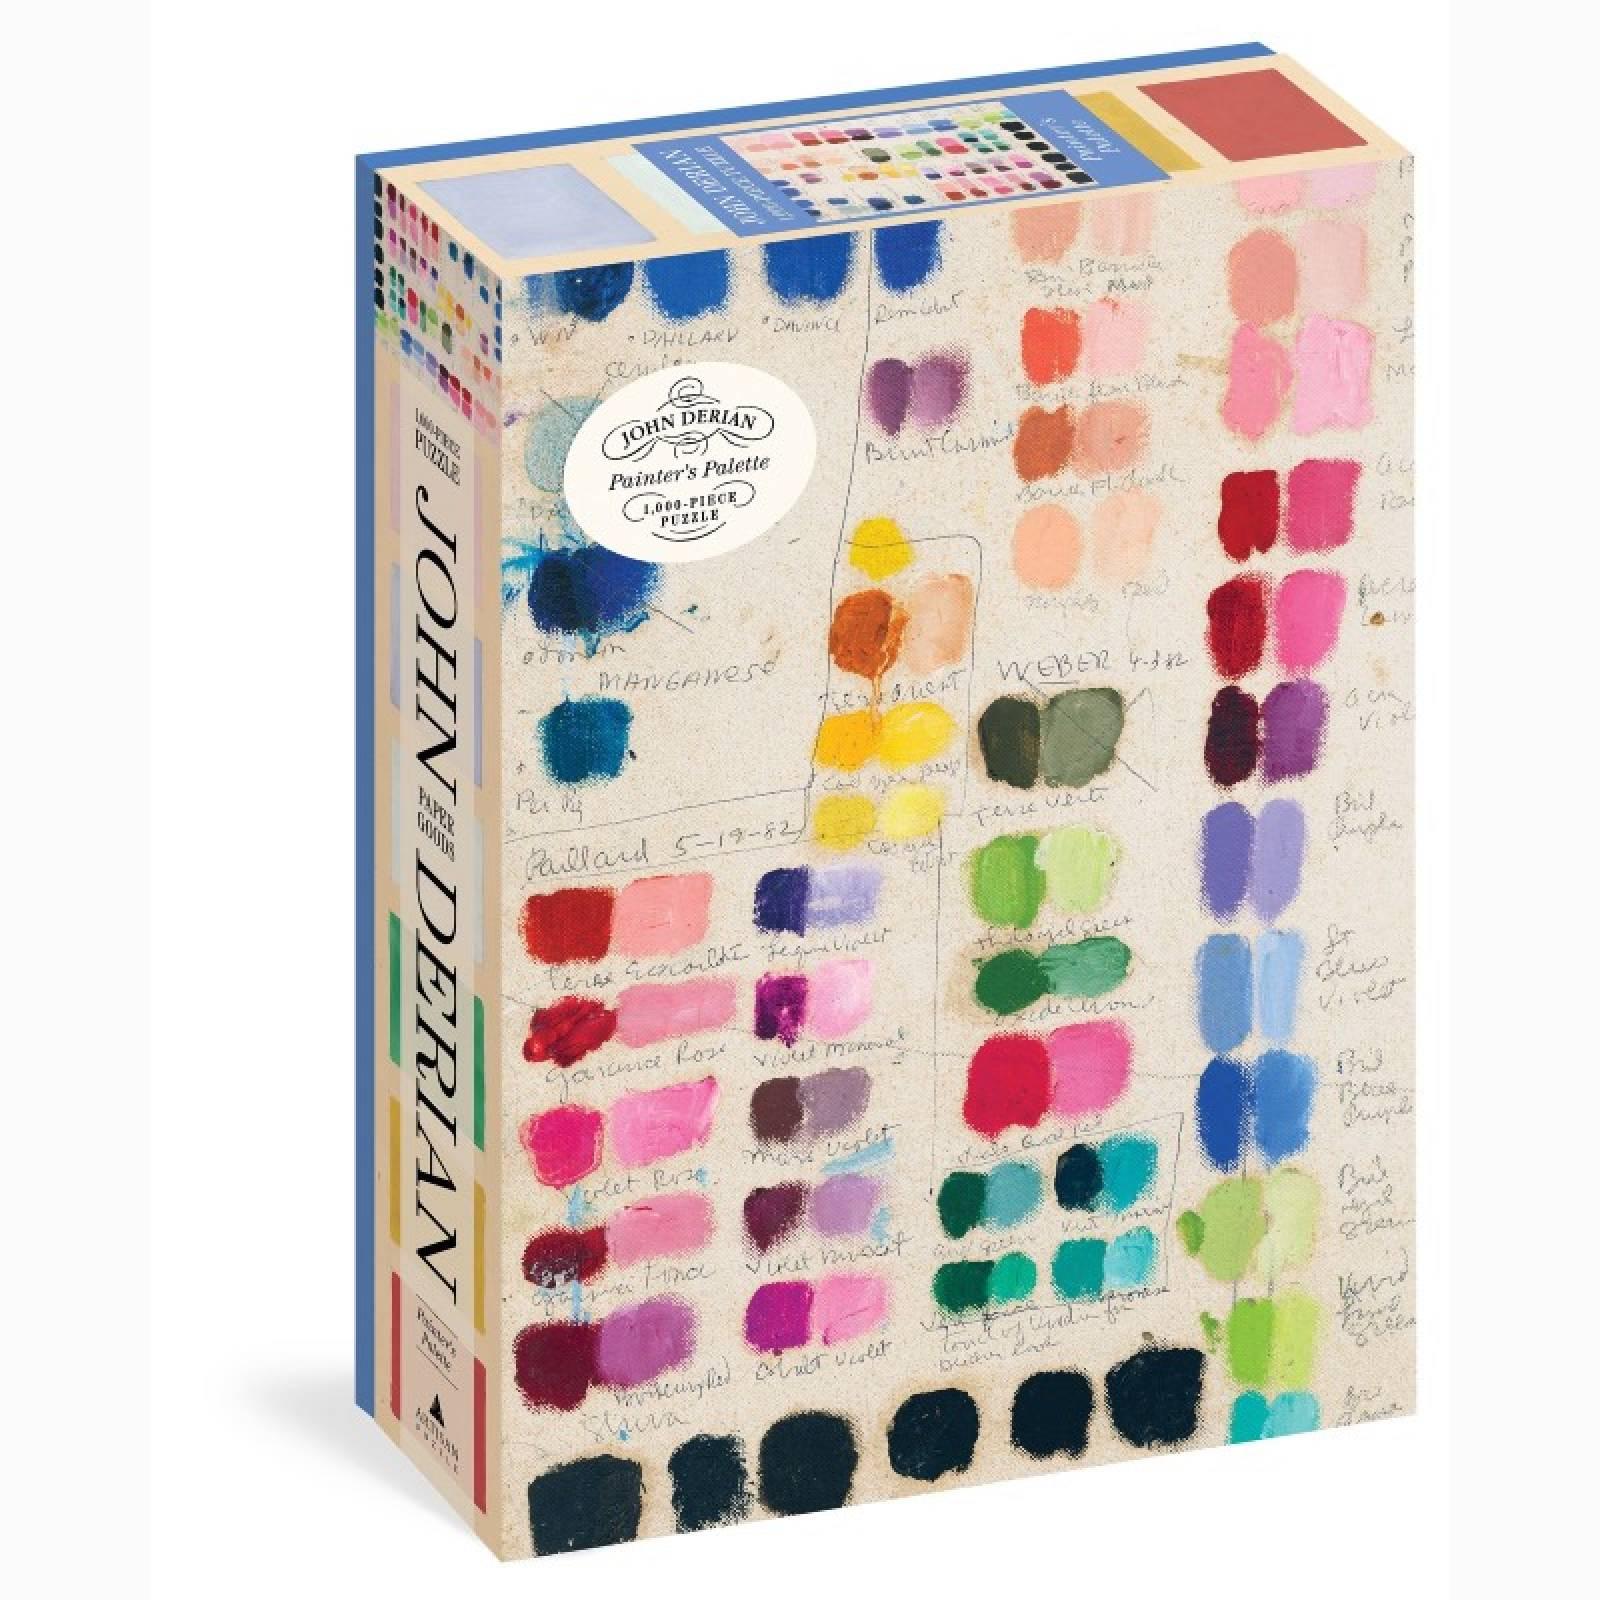 Painters Palette By John Derian - 1000 Piece Jigsaw Puzzle